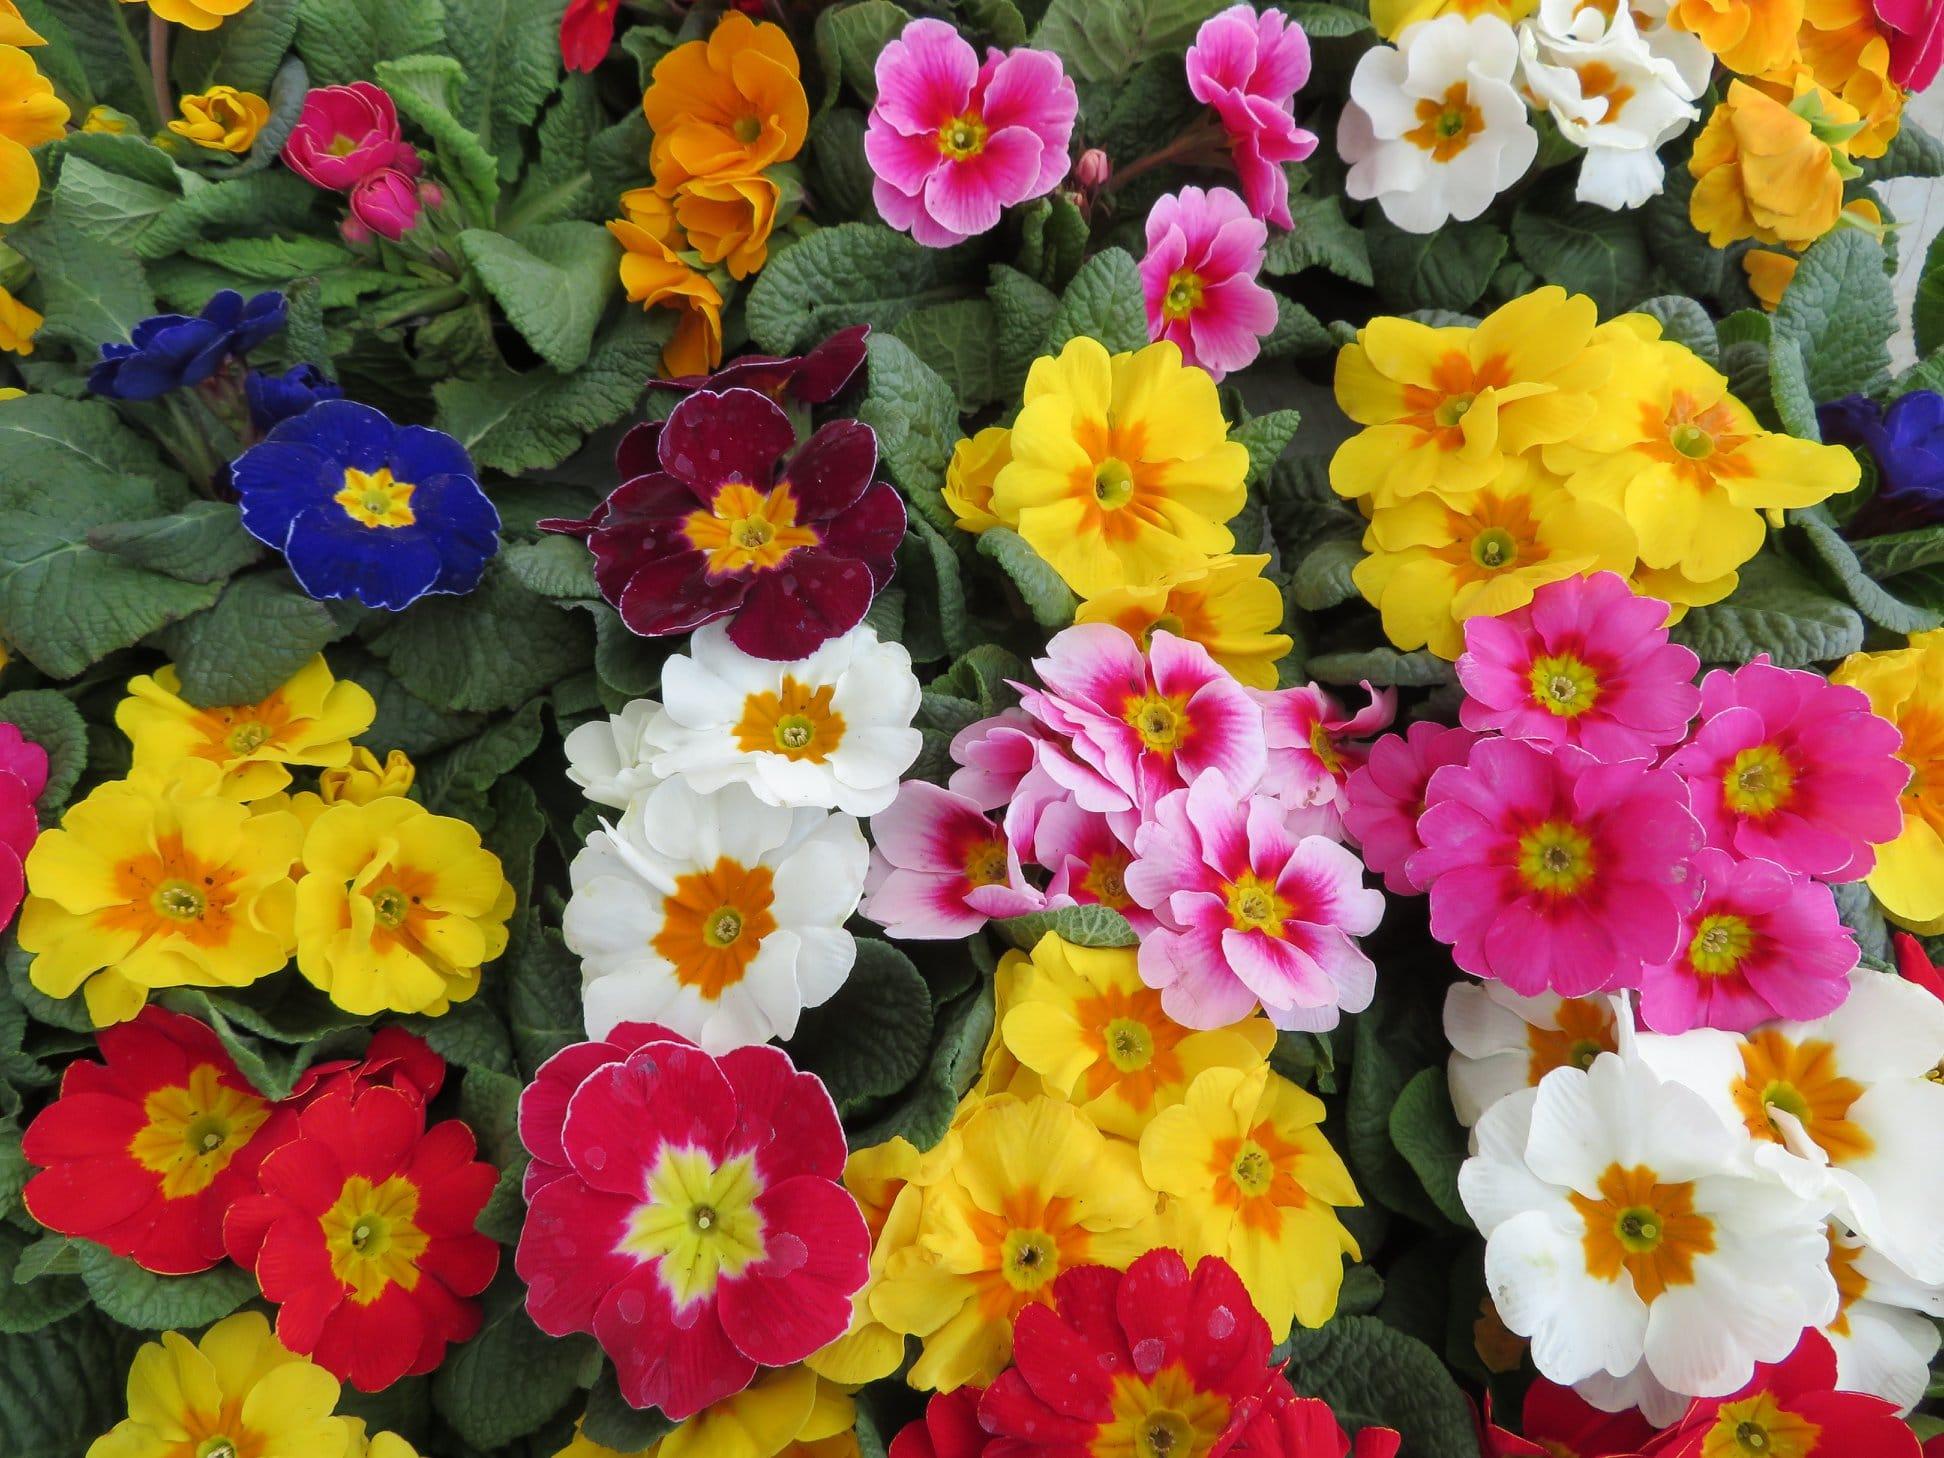 Primevere fleurs printemps Jardinerie Jurassienne